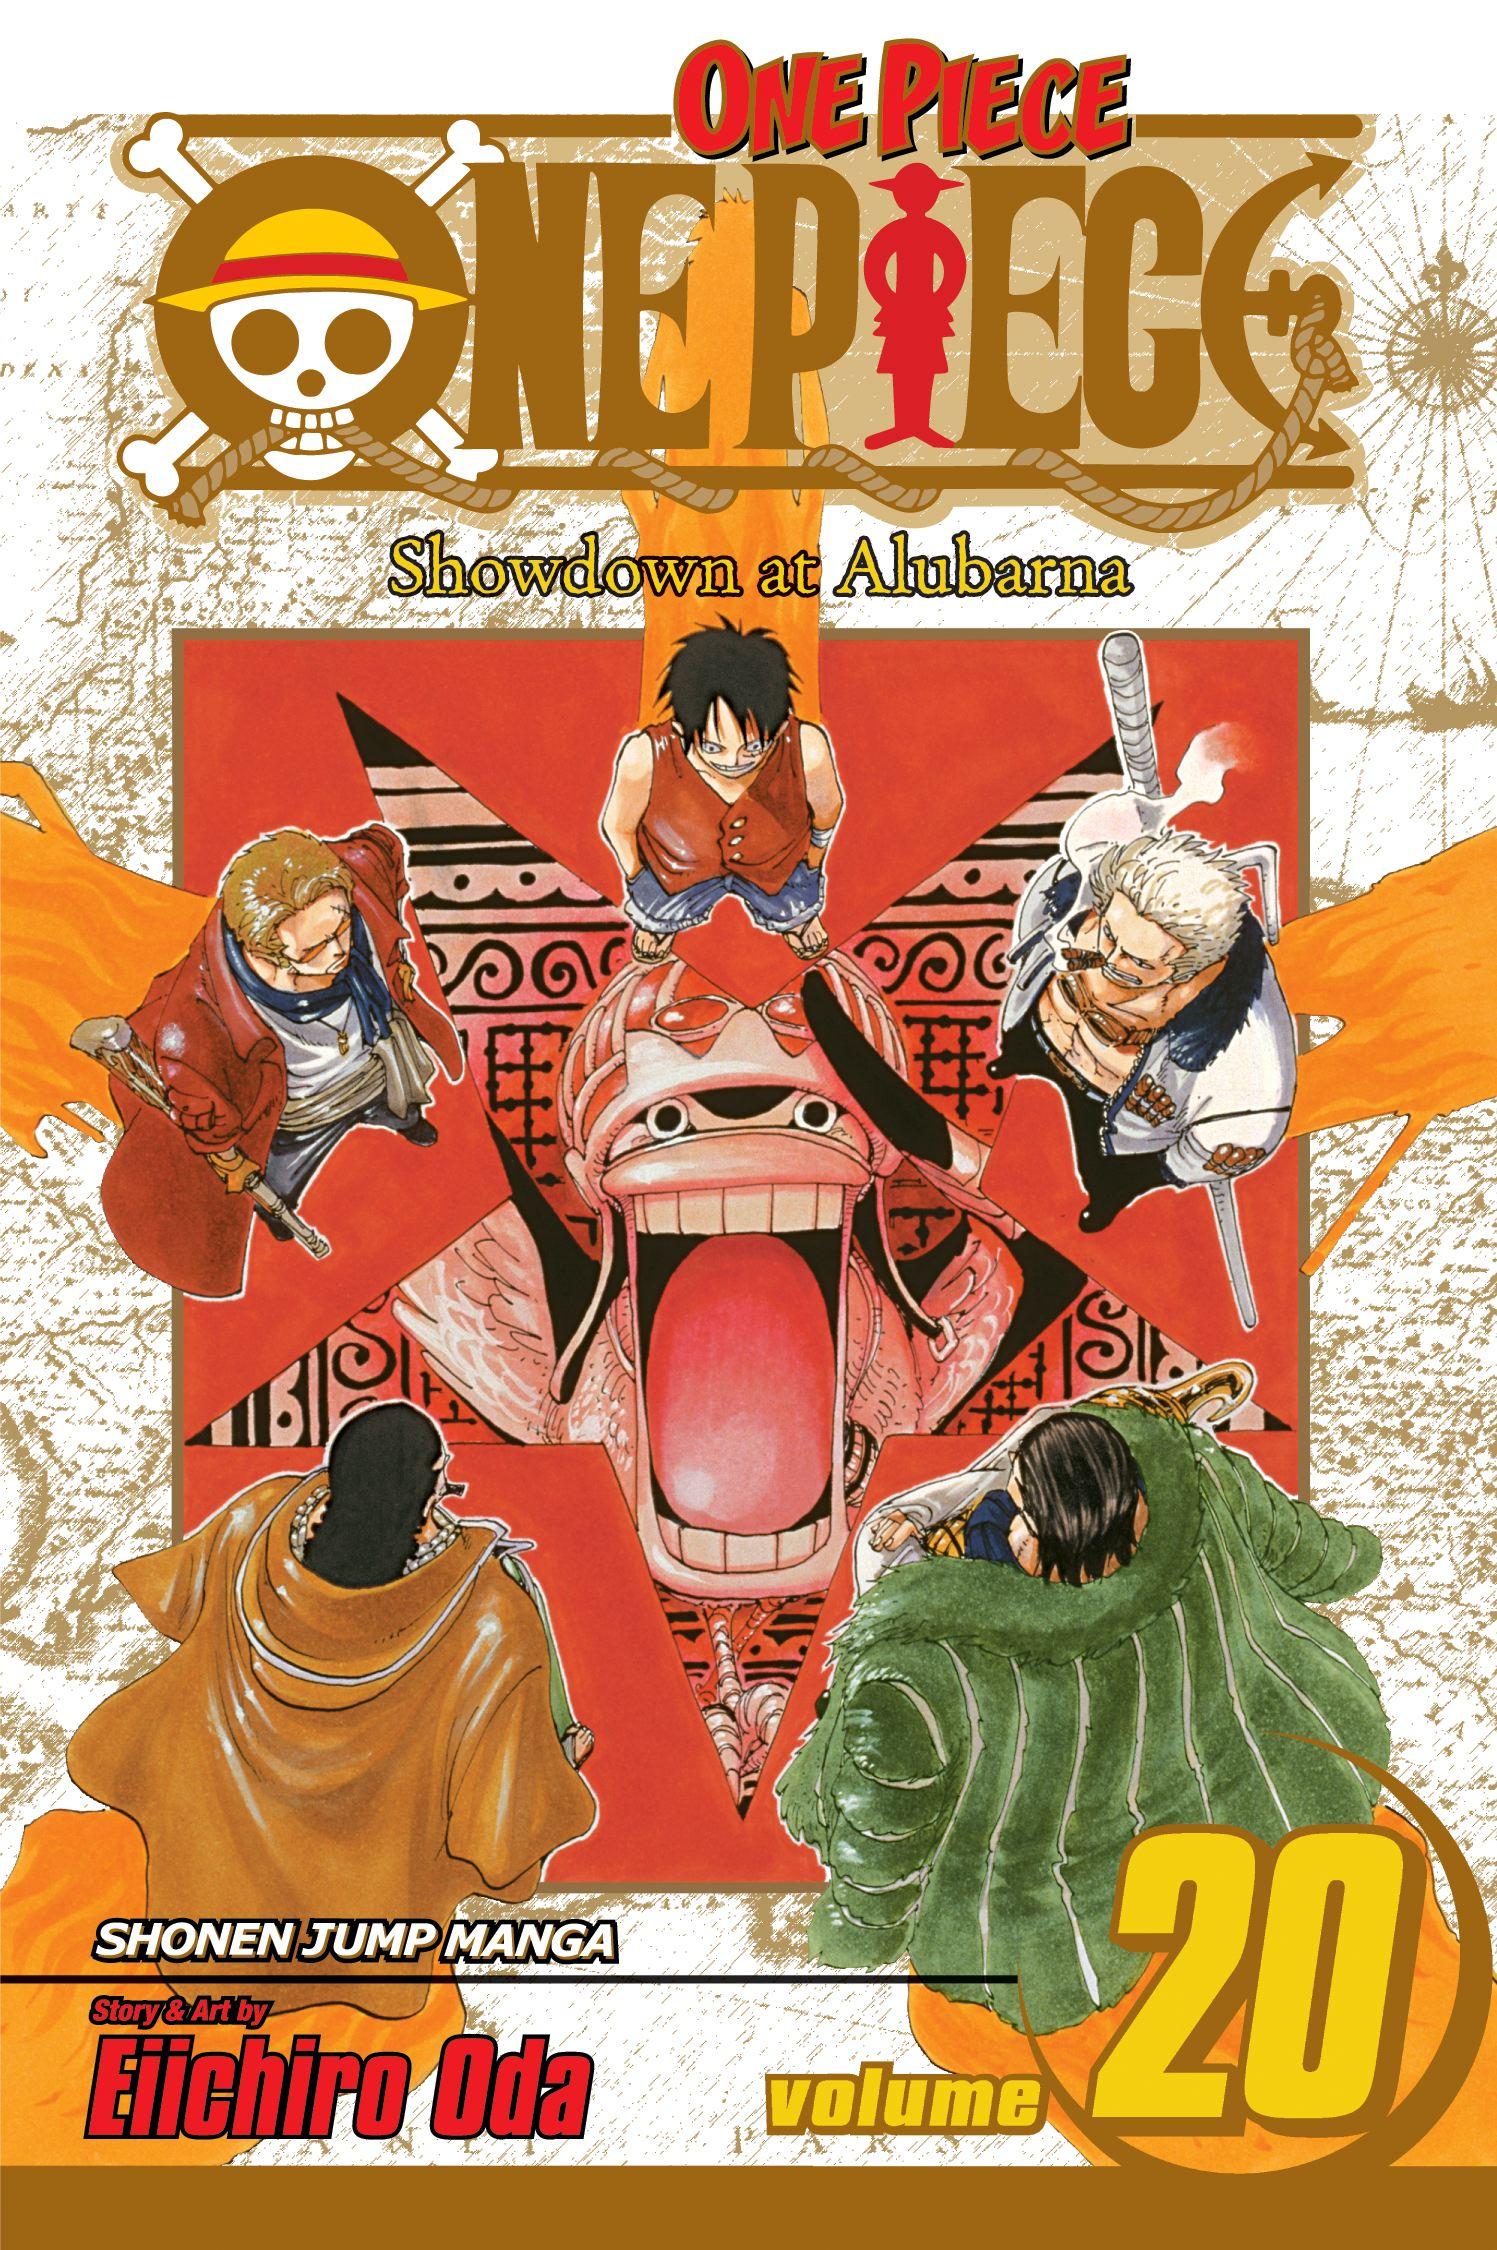 One Piece, Vol. 20   Book by Eiichiro Oda   Official ...